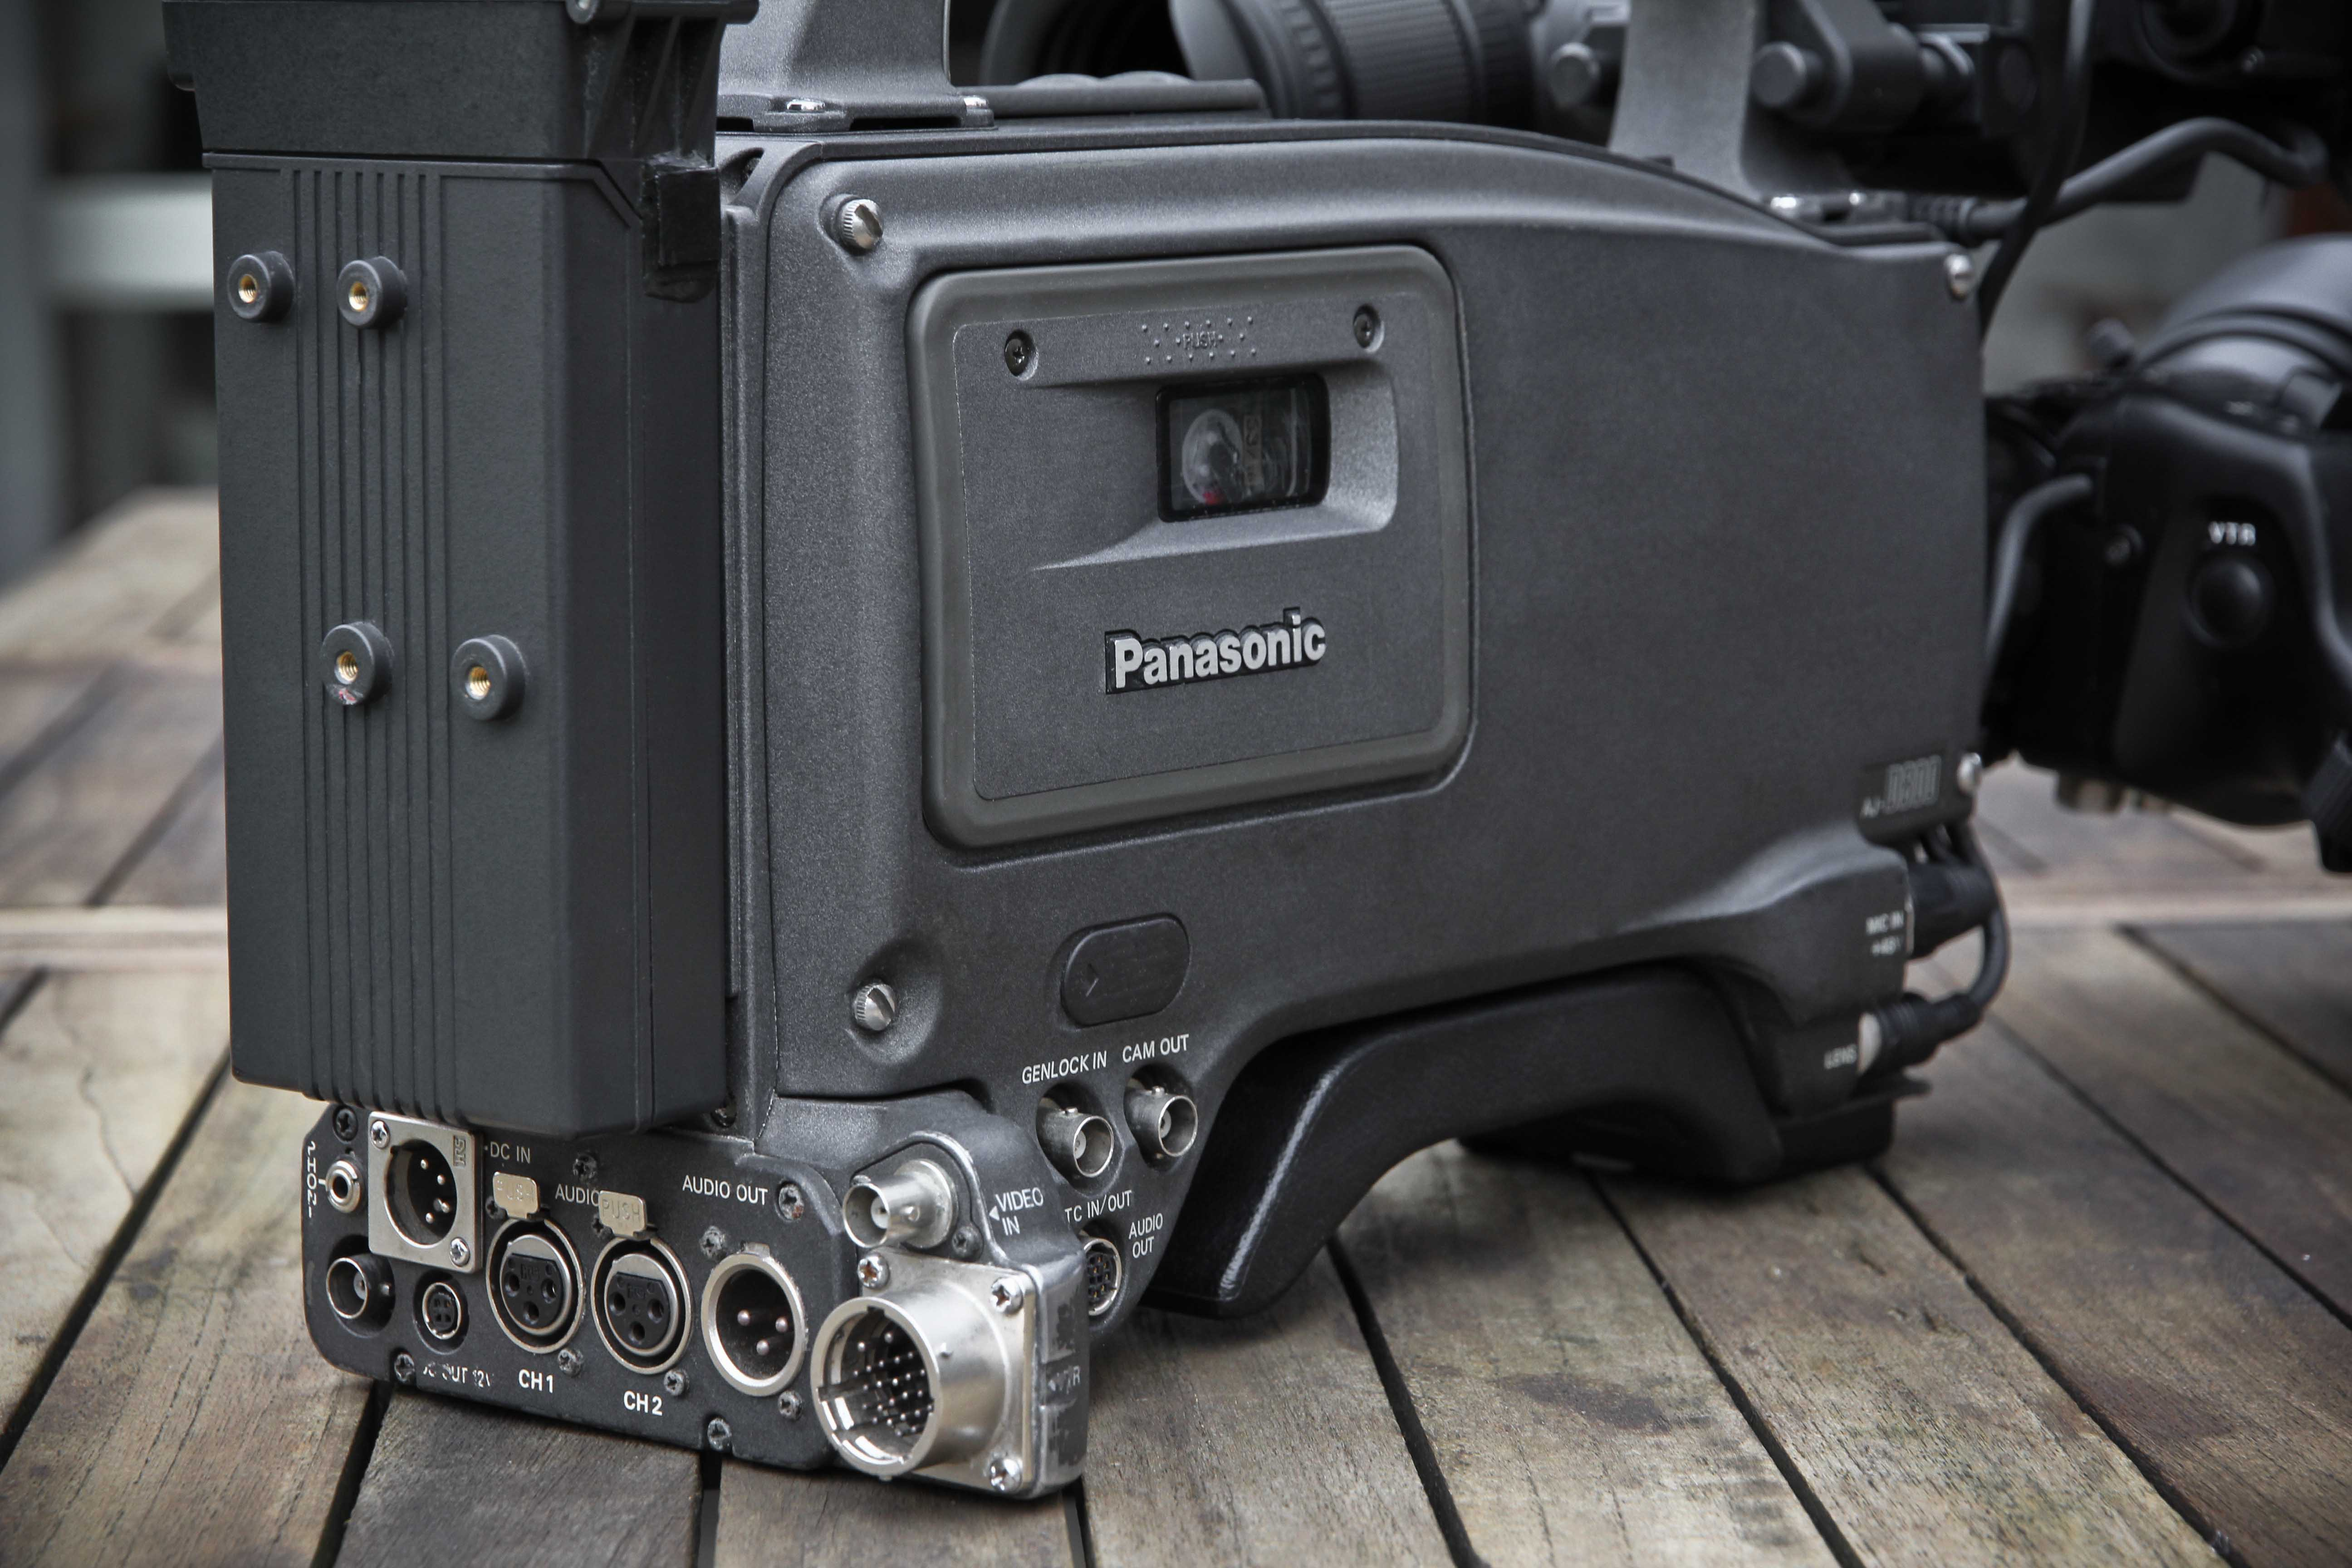 Panasonic AJD-800E -6